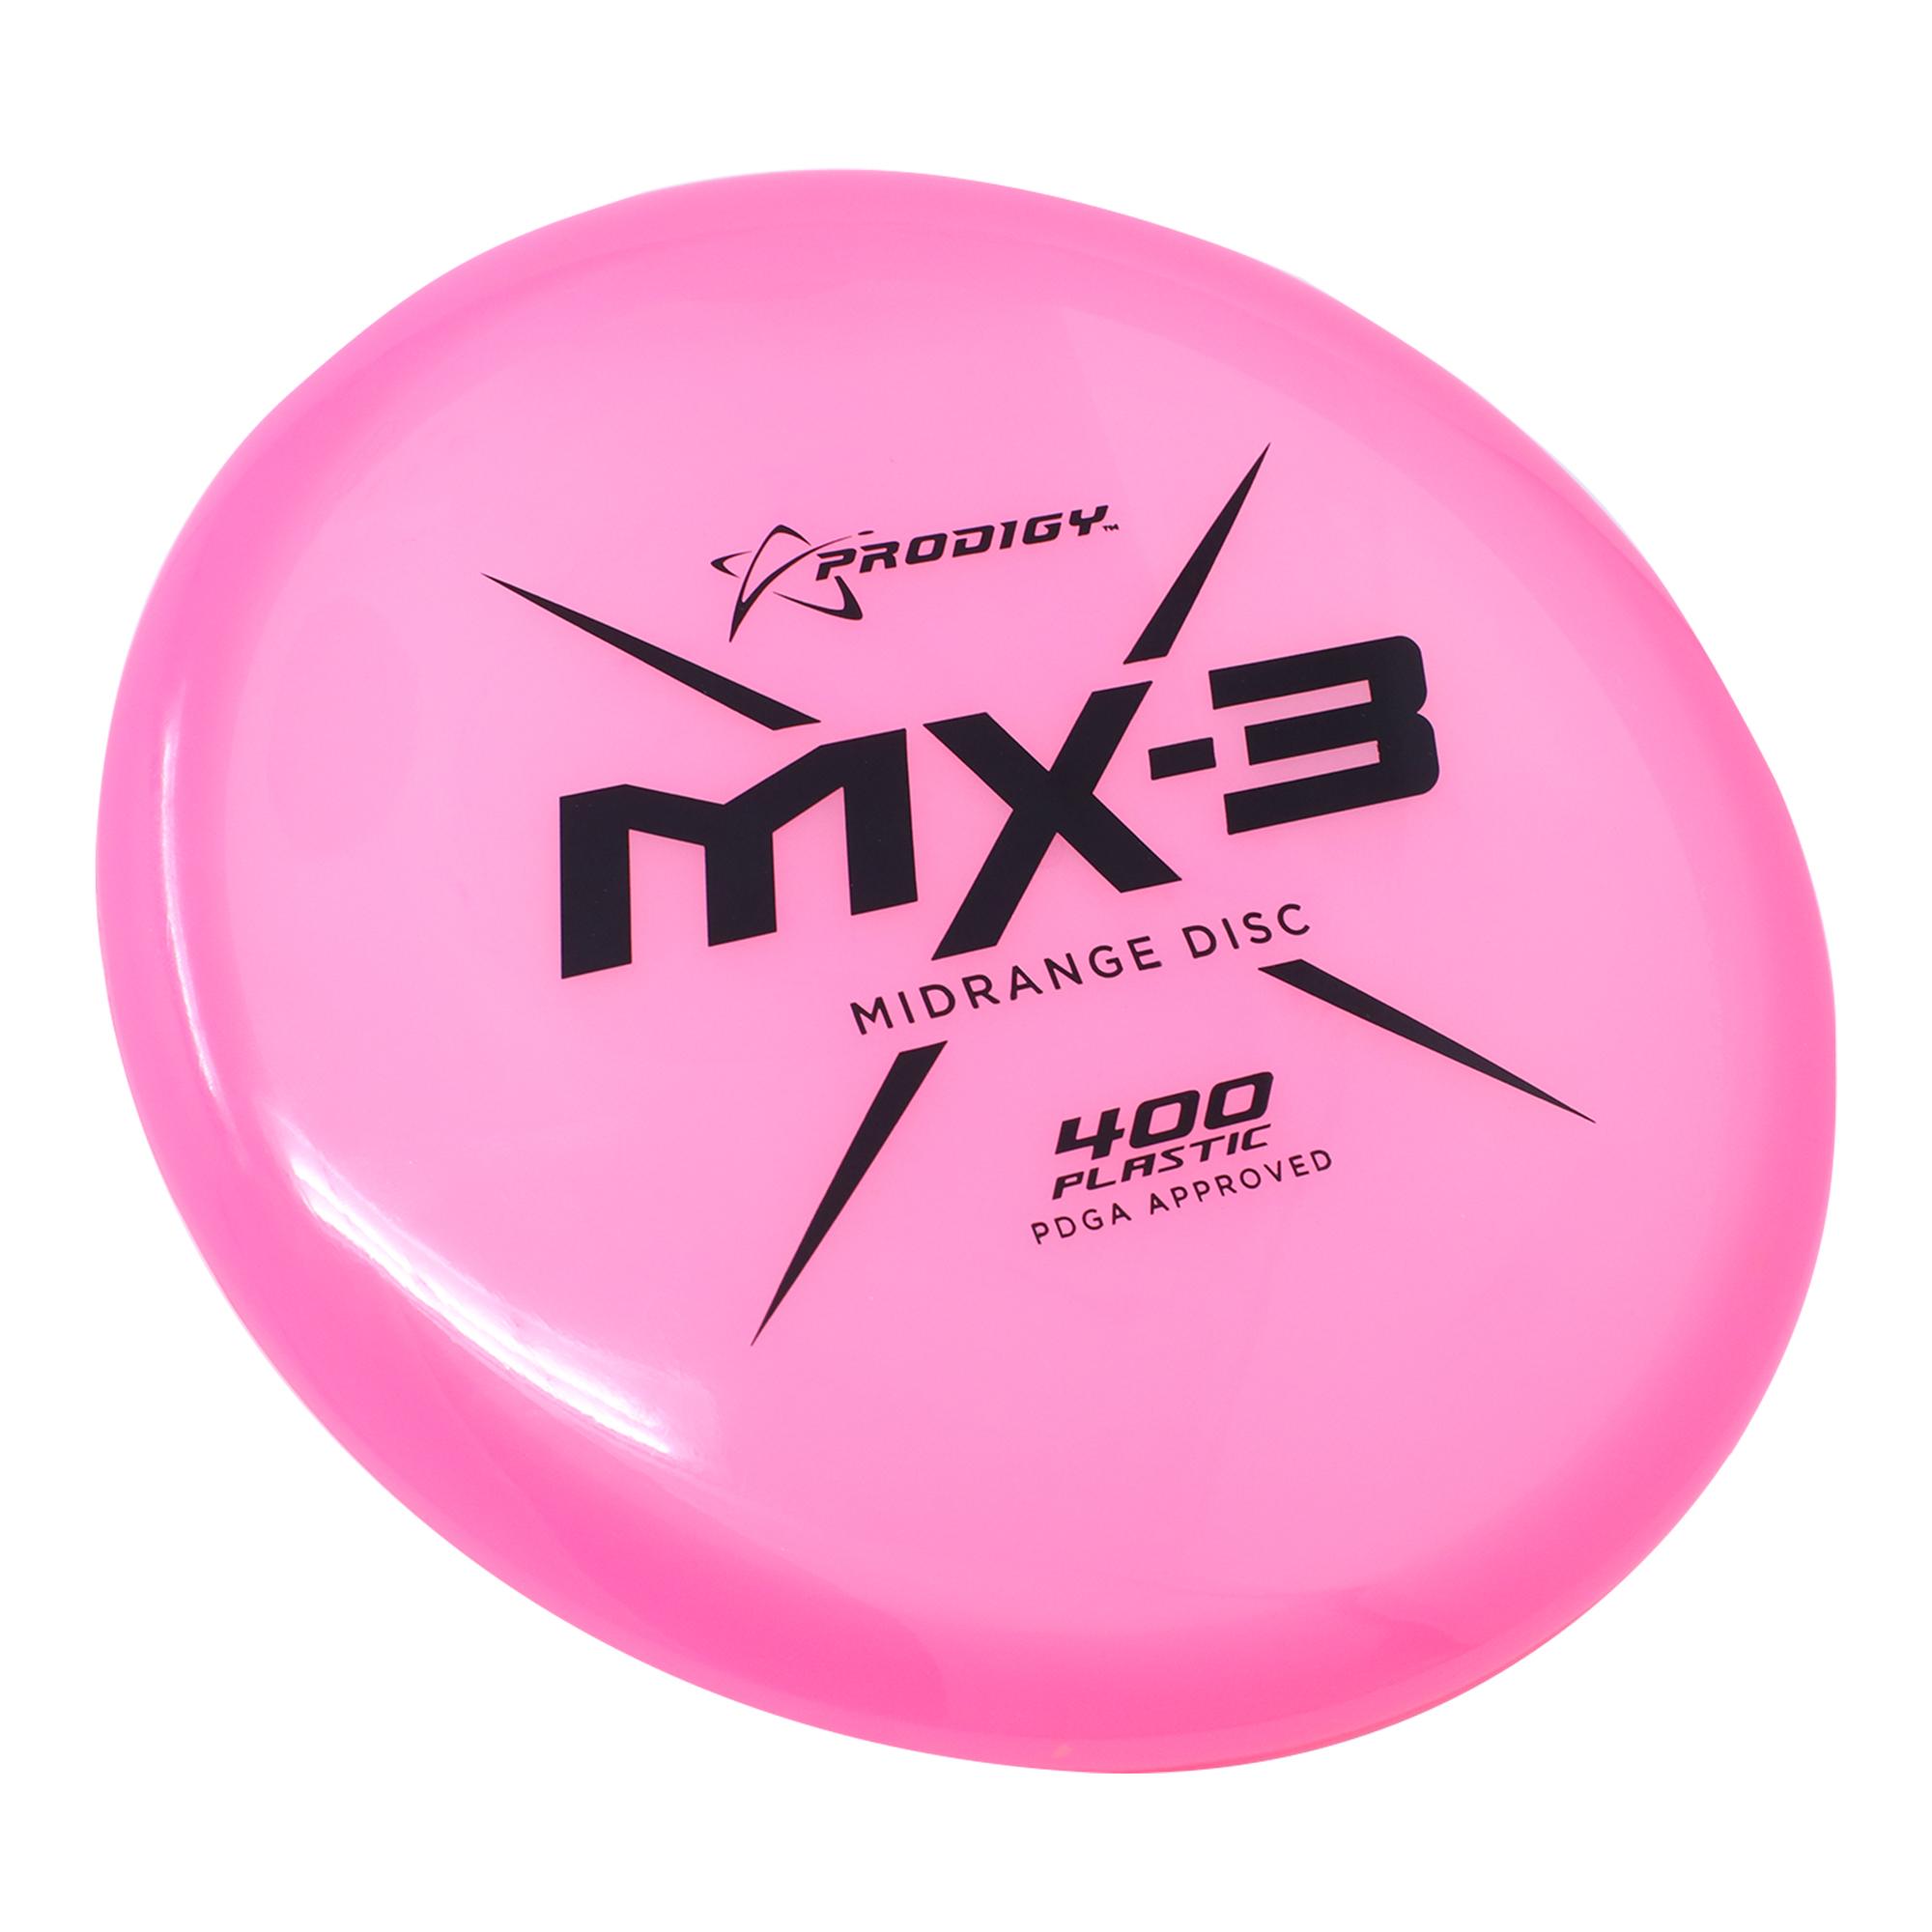 MX-3 400 PLASTIC